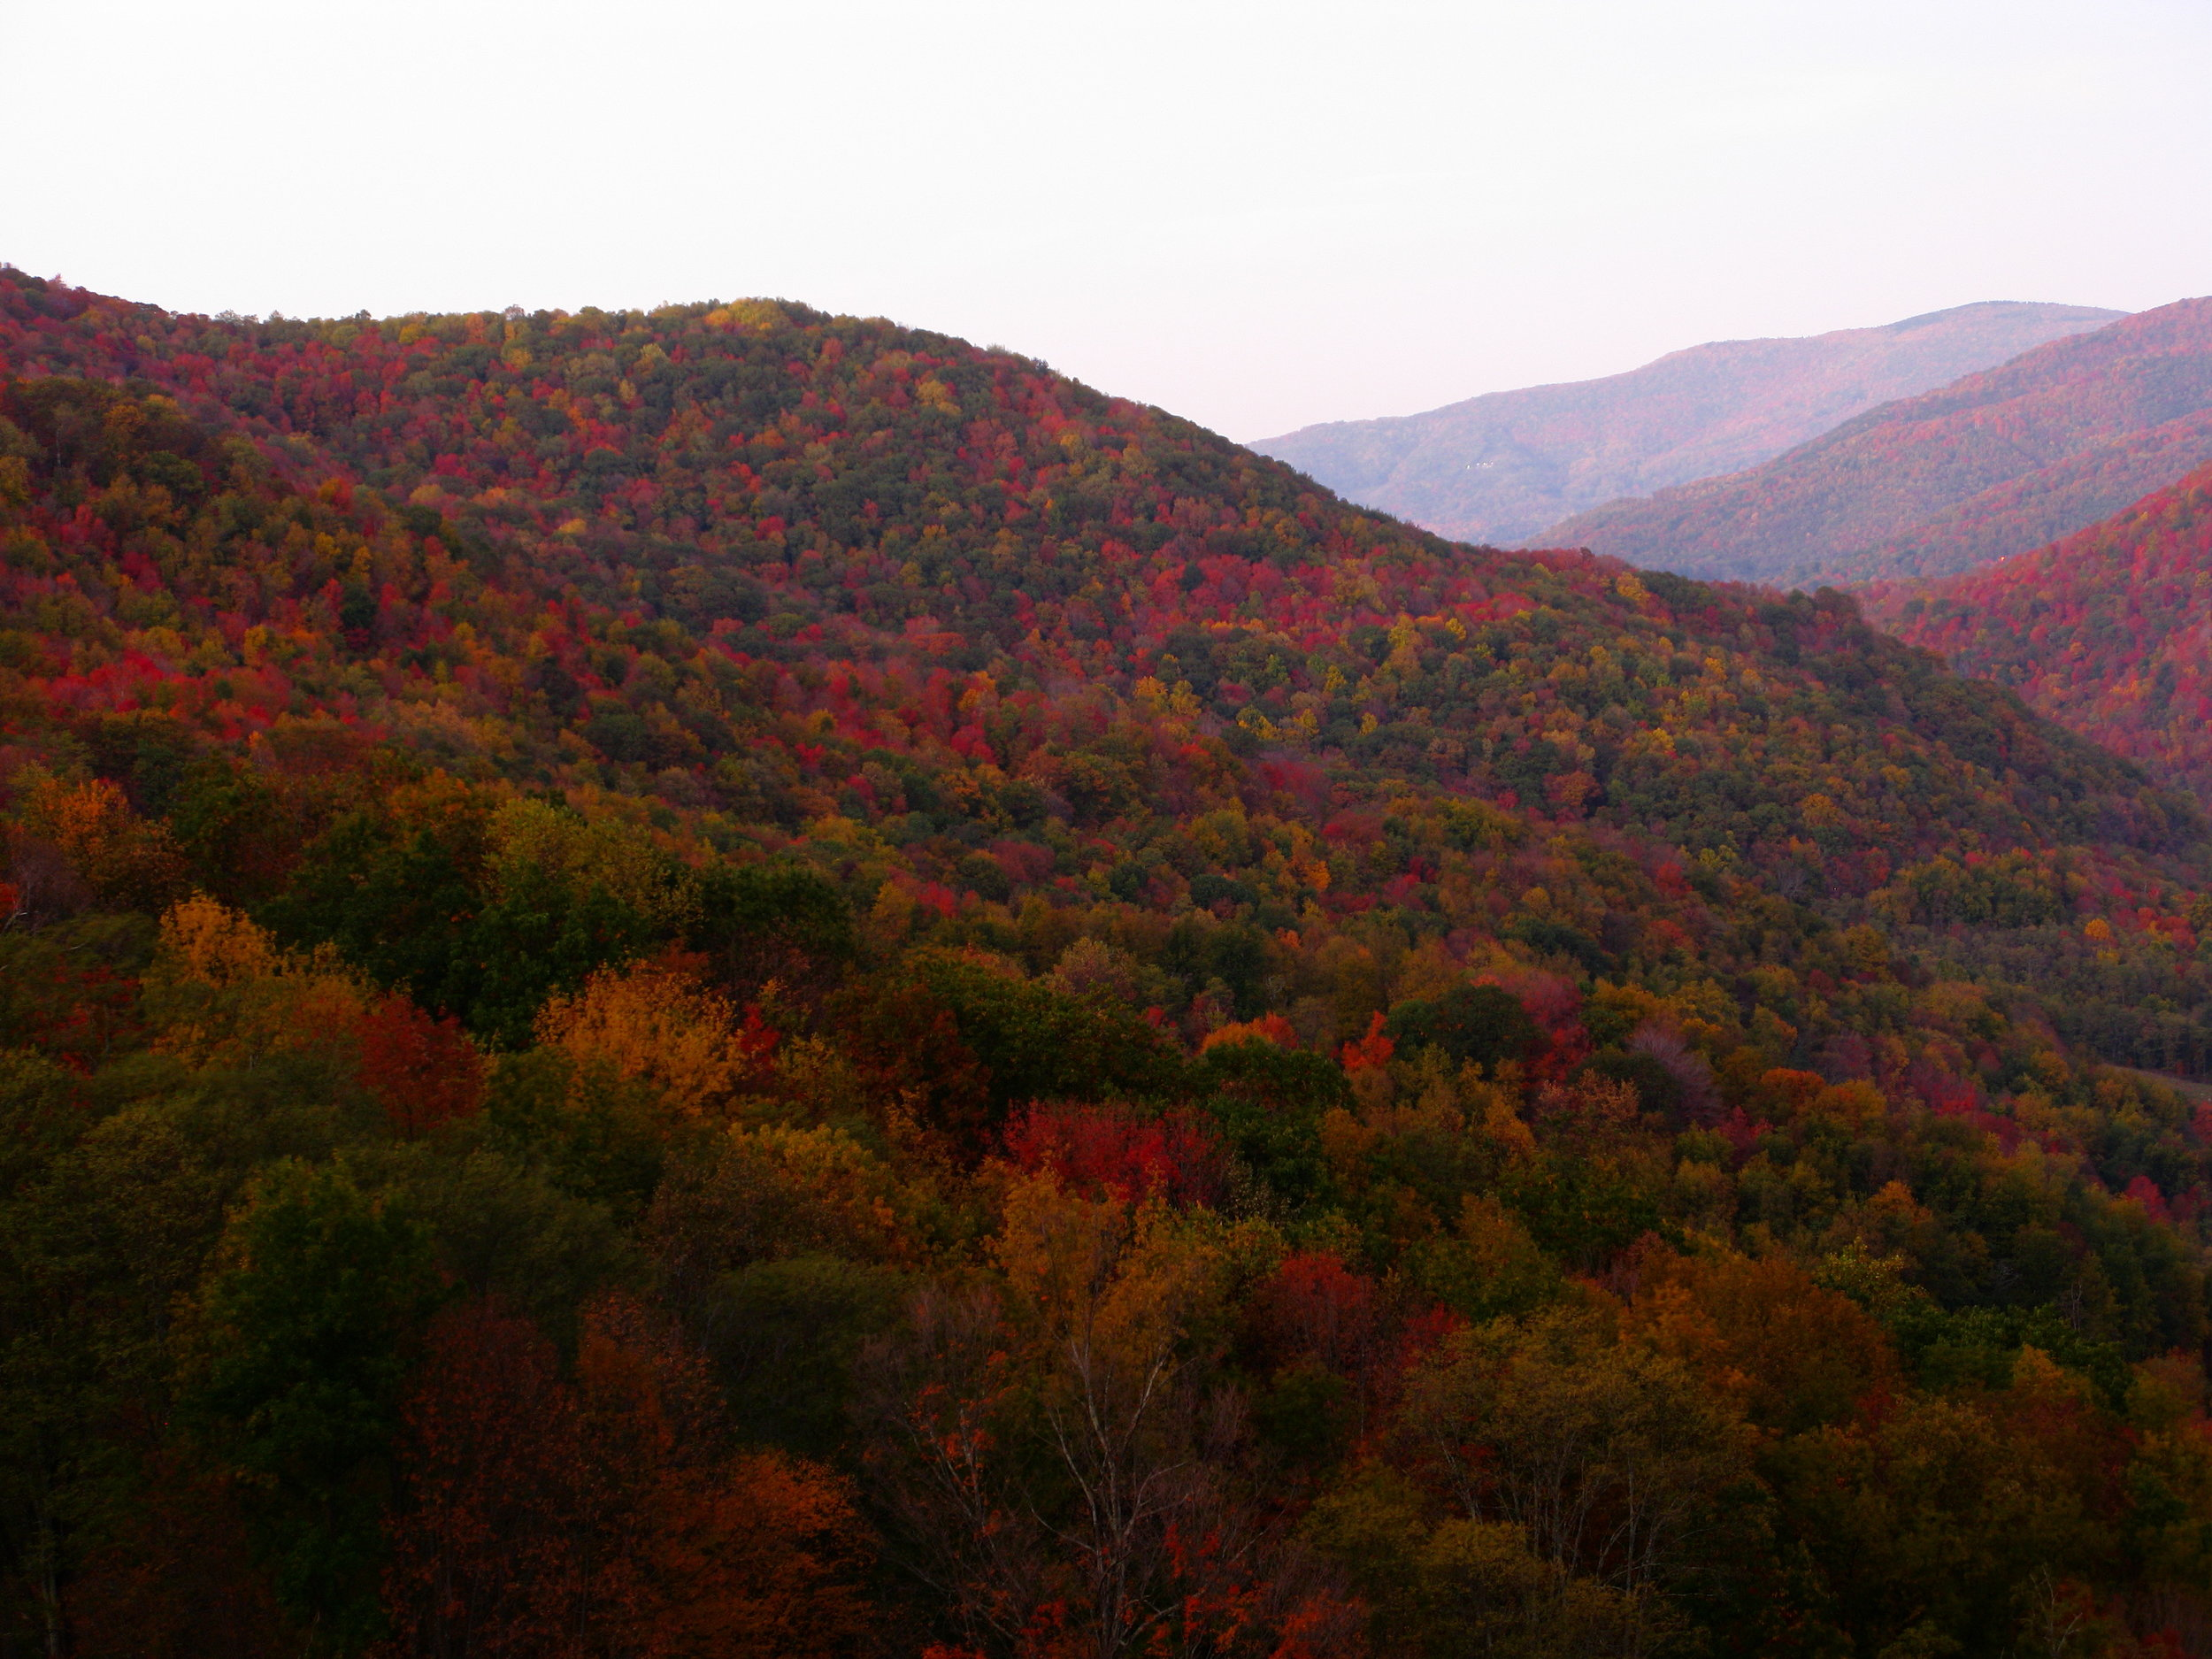 Fall-mountains_-_West_Virginia_-_ForestWander.jpg